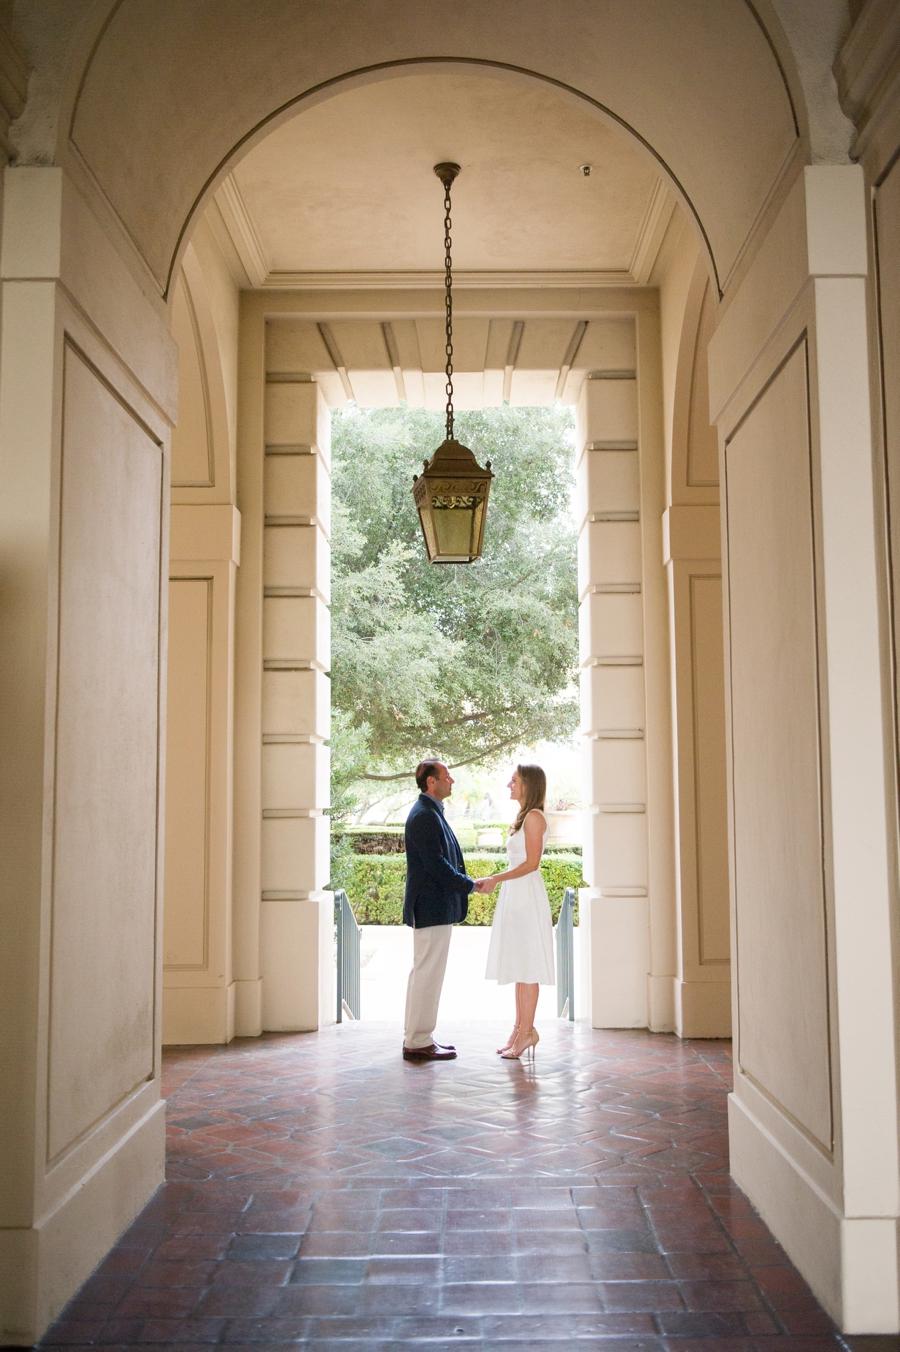 Pasadena_City_Hall_Engagement_Photos_JC_02.jpg